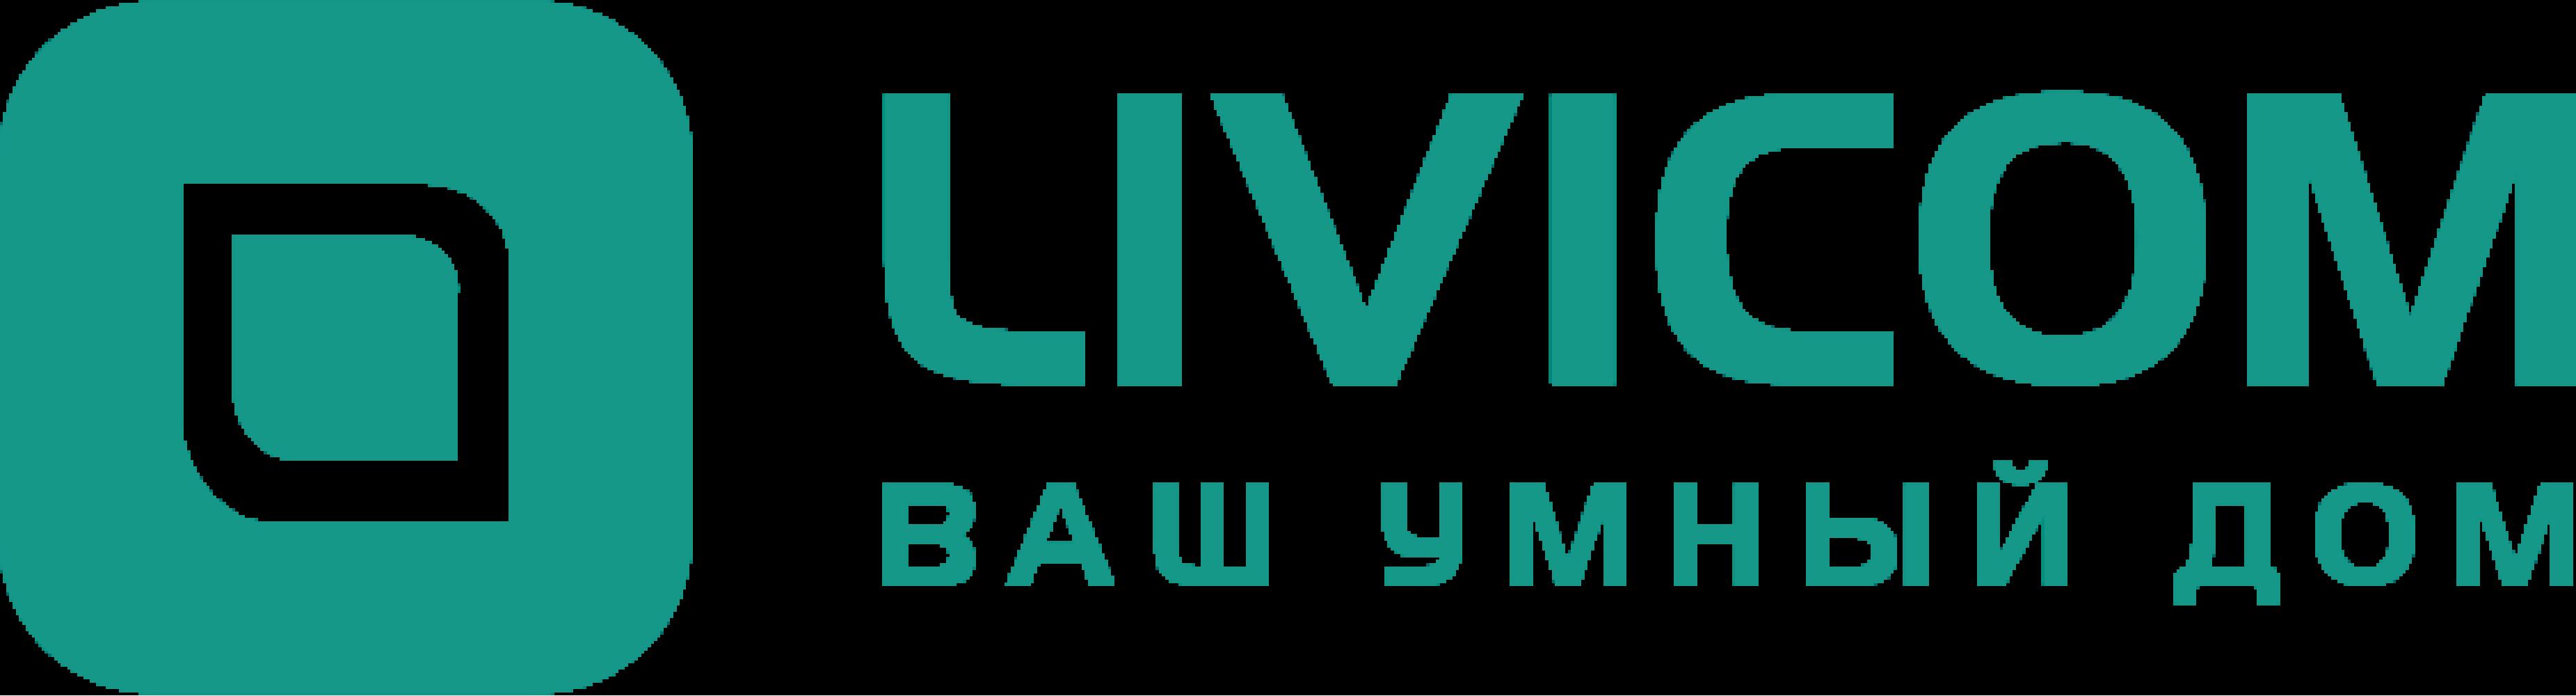 "Livi (Livicom) - бренд производителя систем безопасности и мониторинга НПП ""Стелс"""